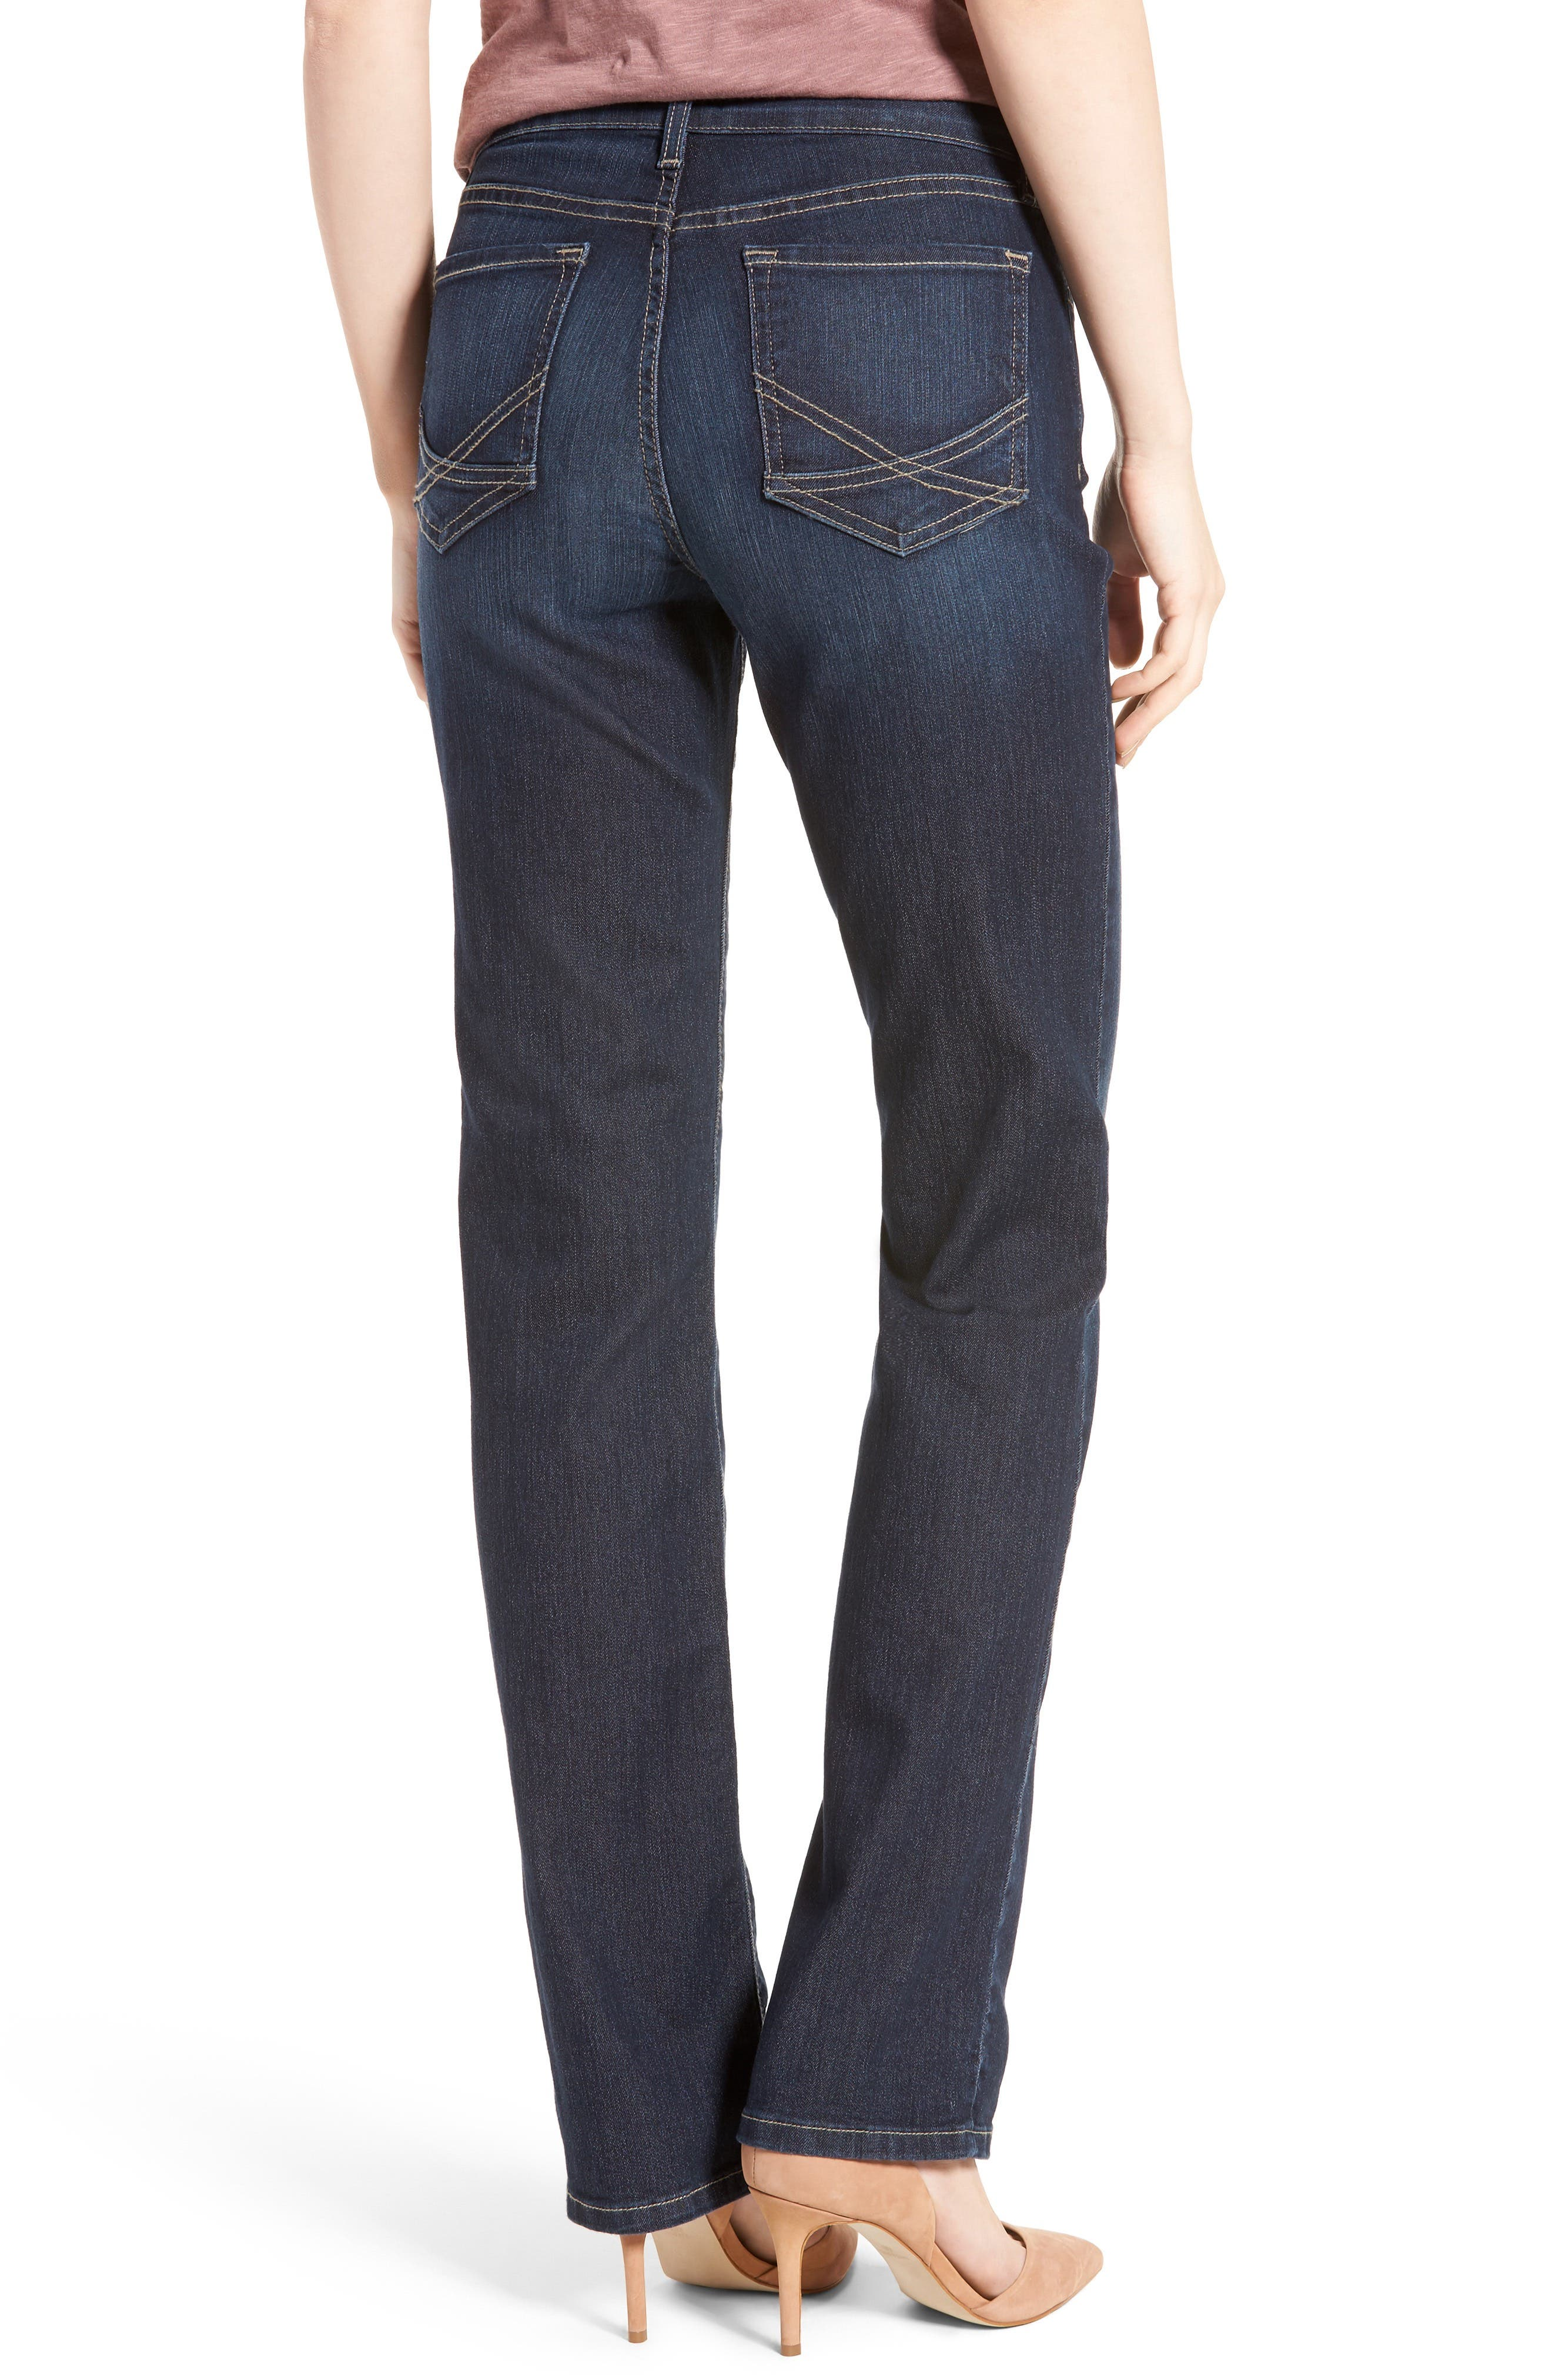 Marilyn Stretch Straight Leg Jeans,                             Alternate thumbnail 2, color,                             425